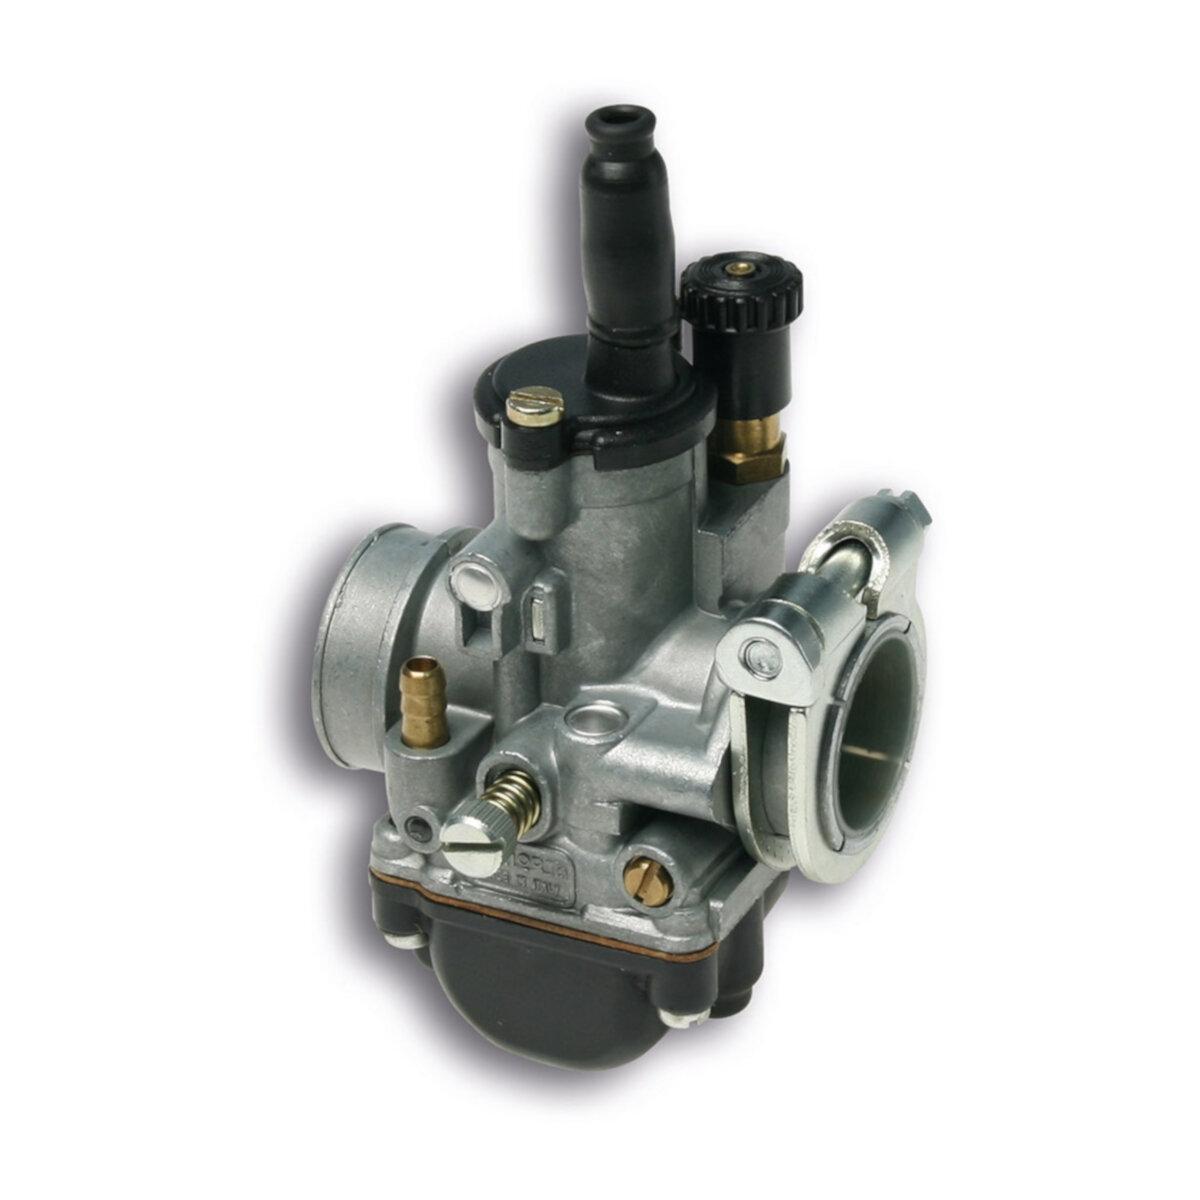 Carburateur Malossi PHBG 19,5 A Garelli Noi